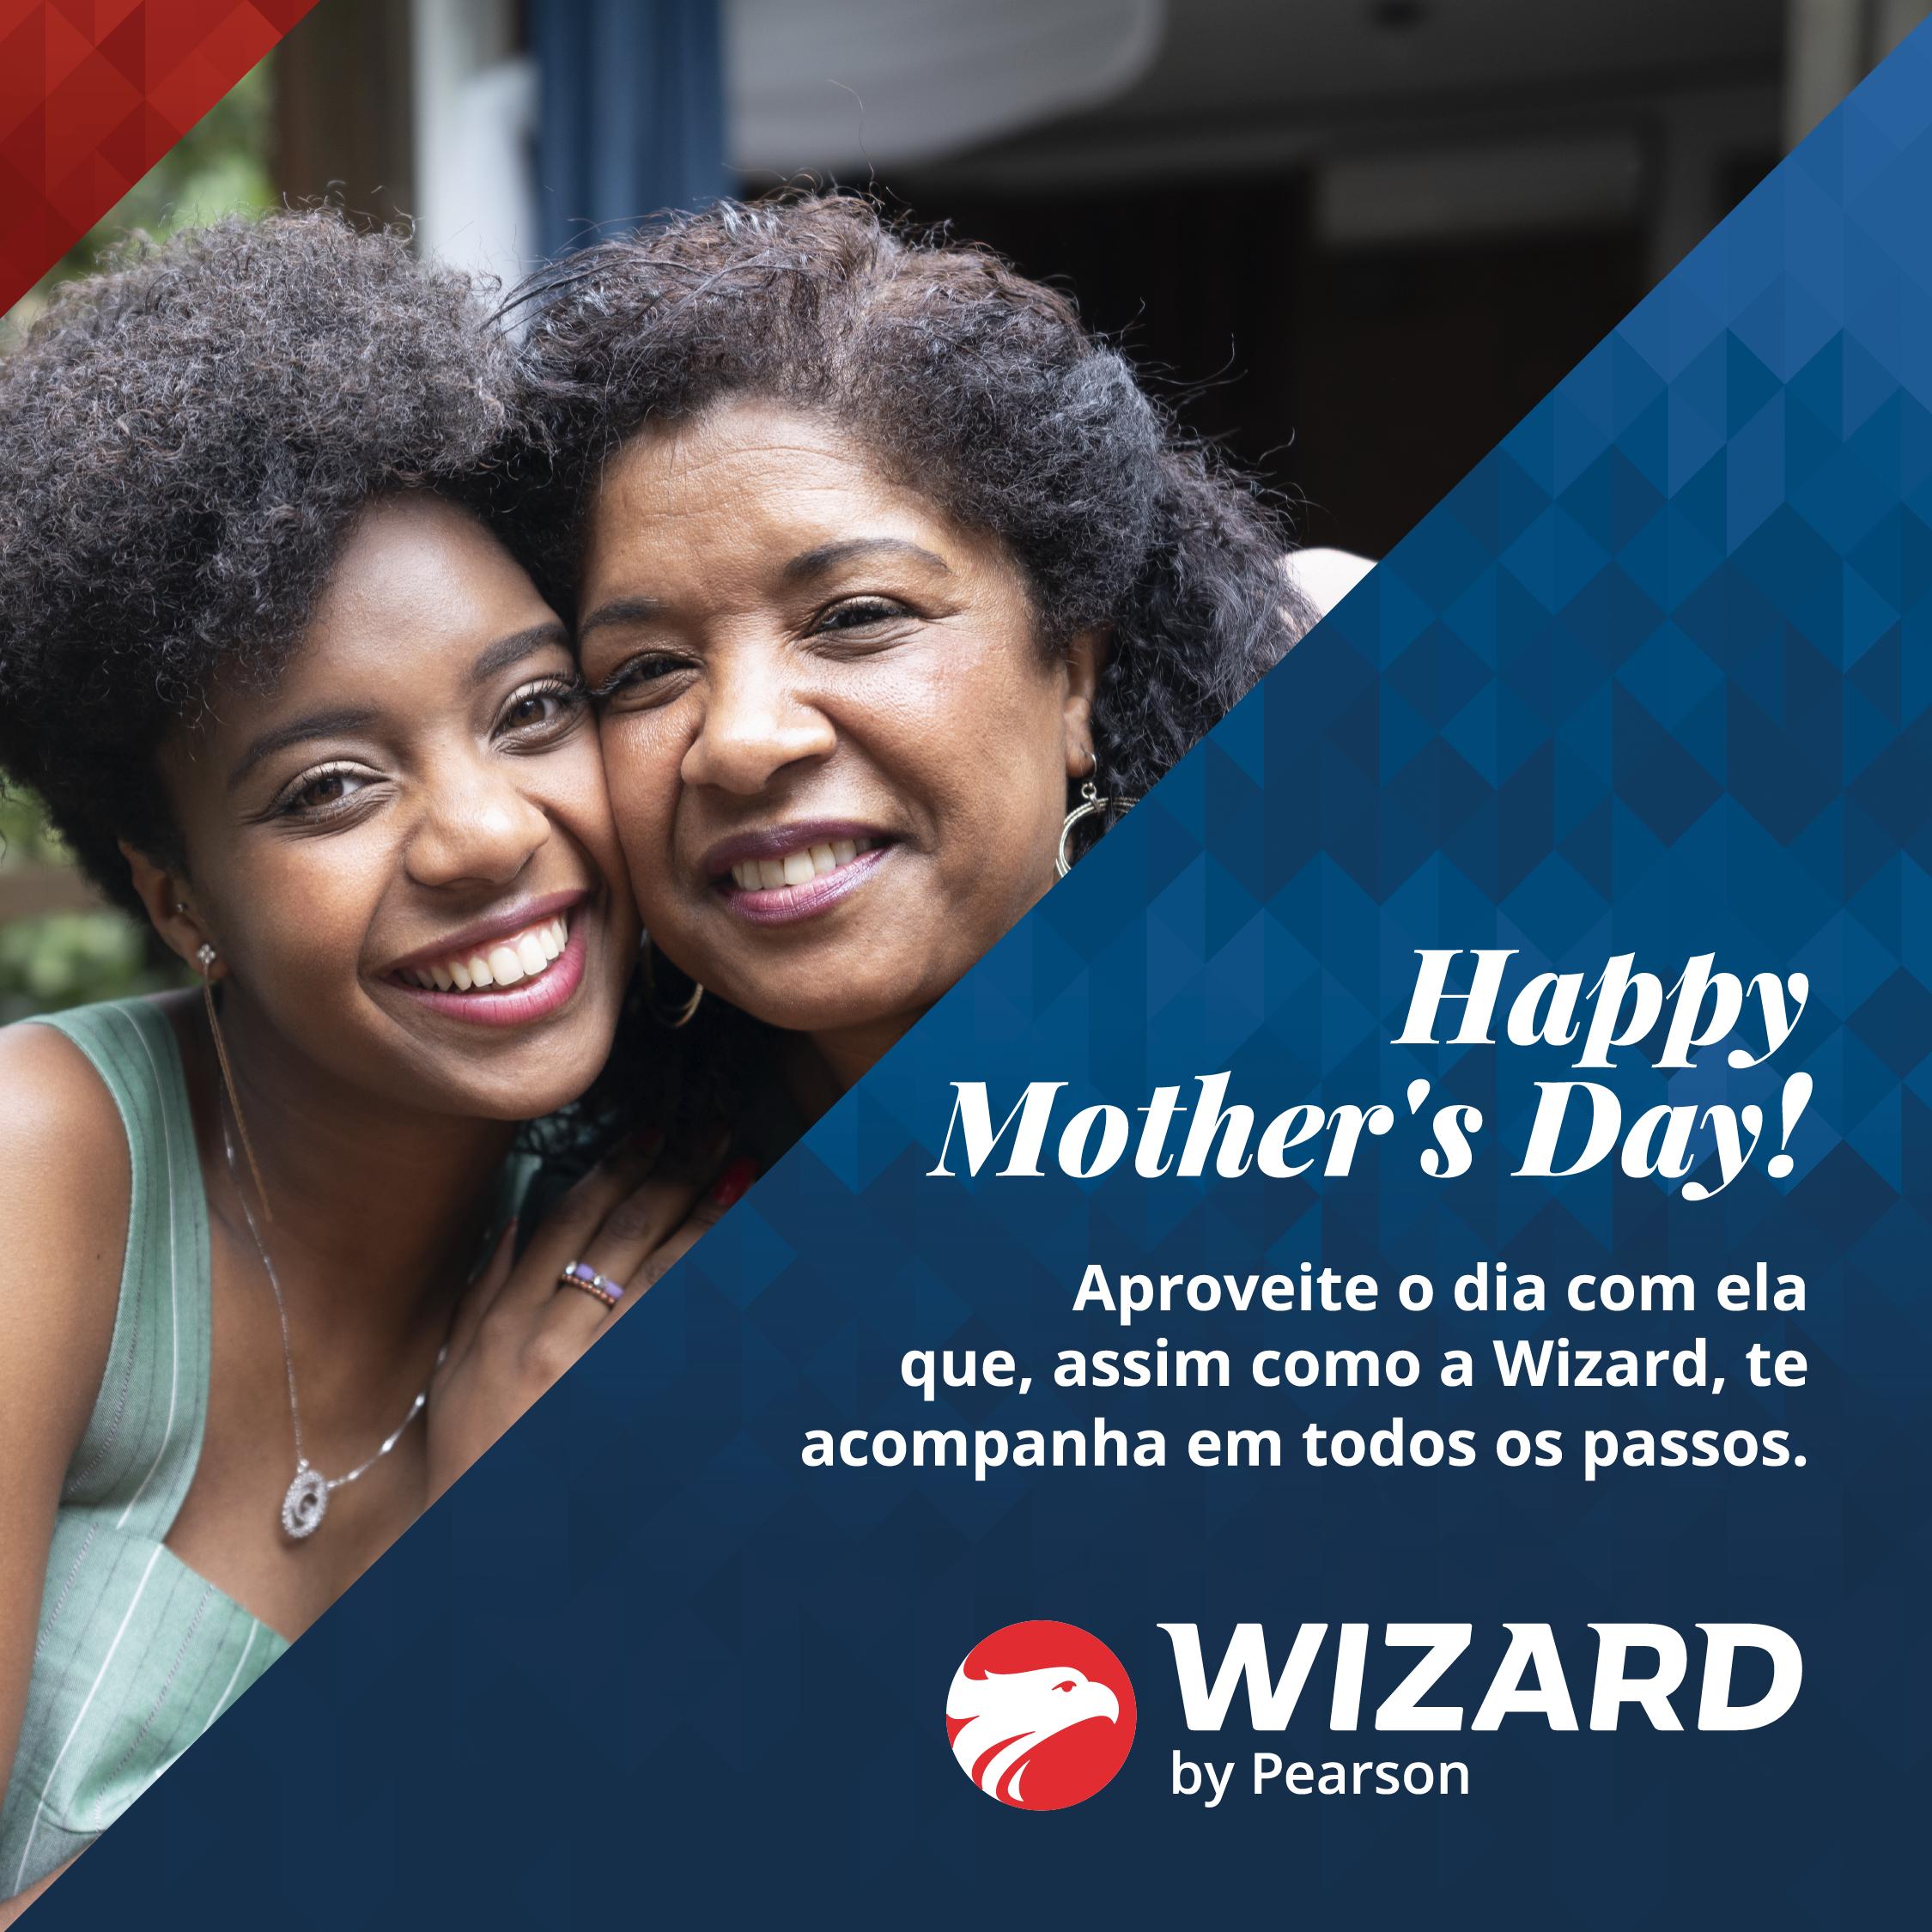 Dia das mães Wizard